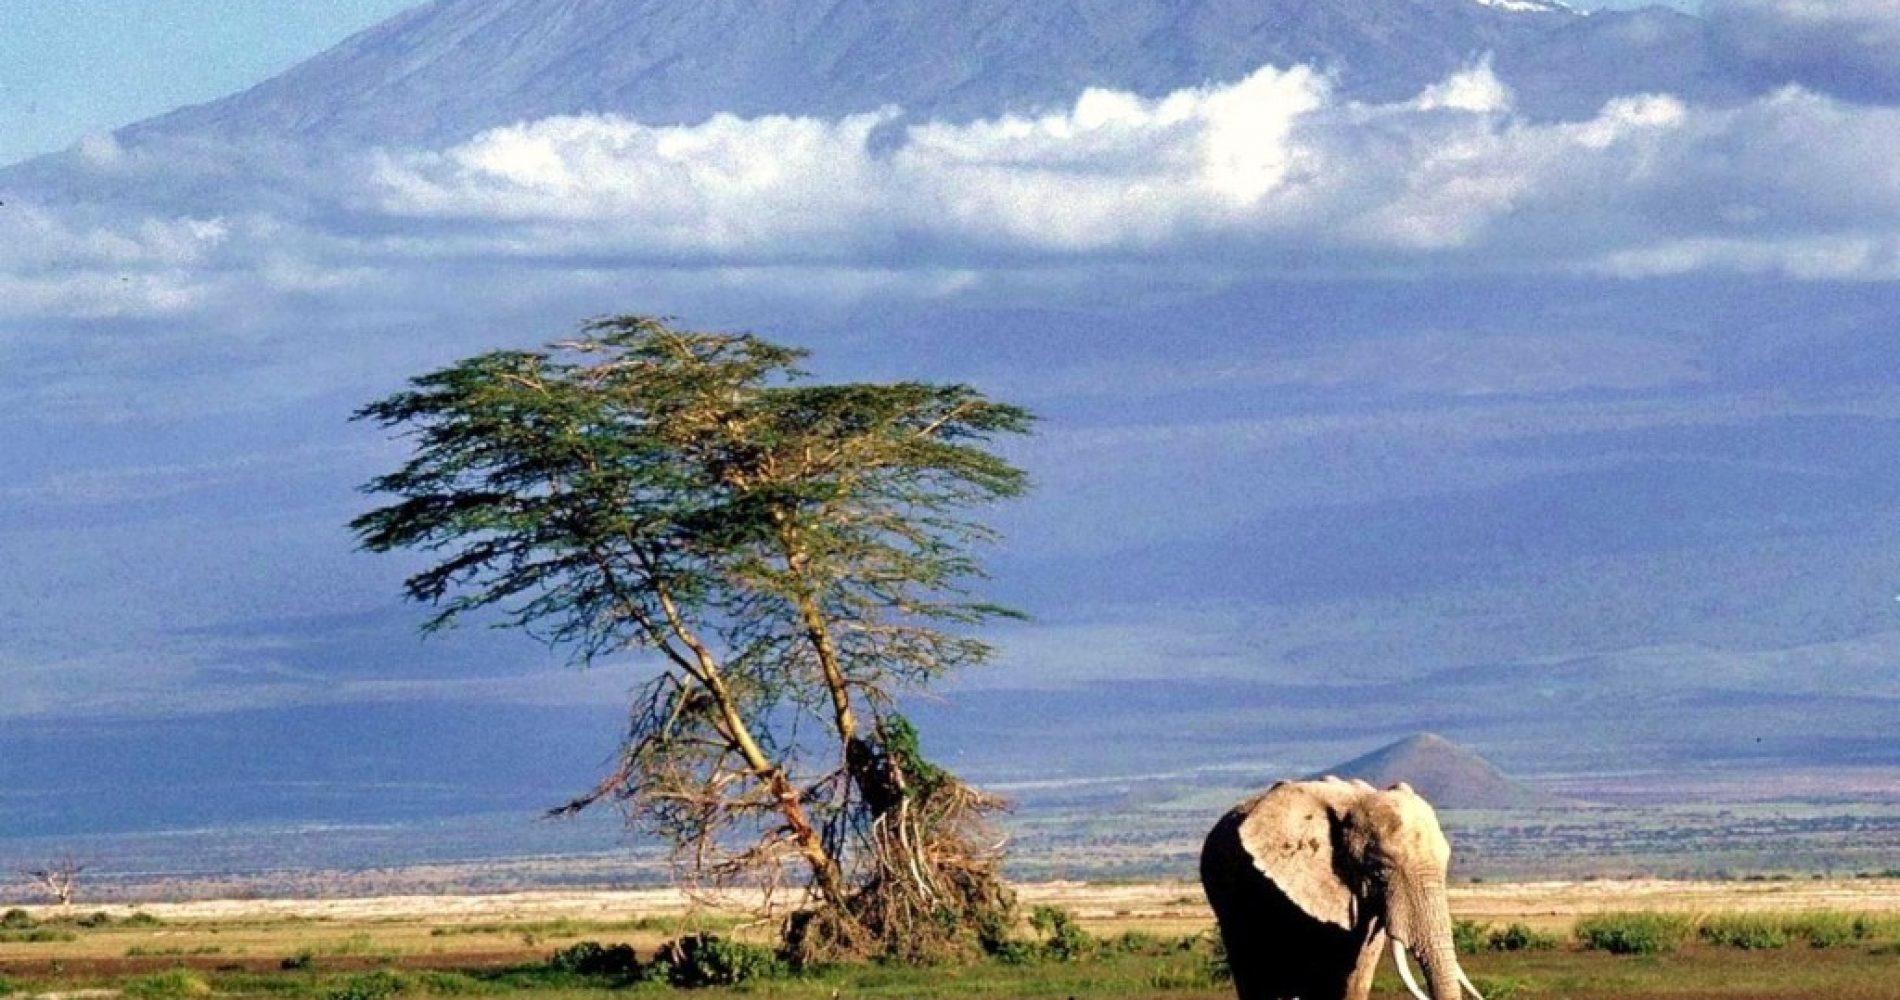 Tanzania_Safari_Of_Tanzania-FILEminimizer